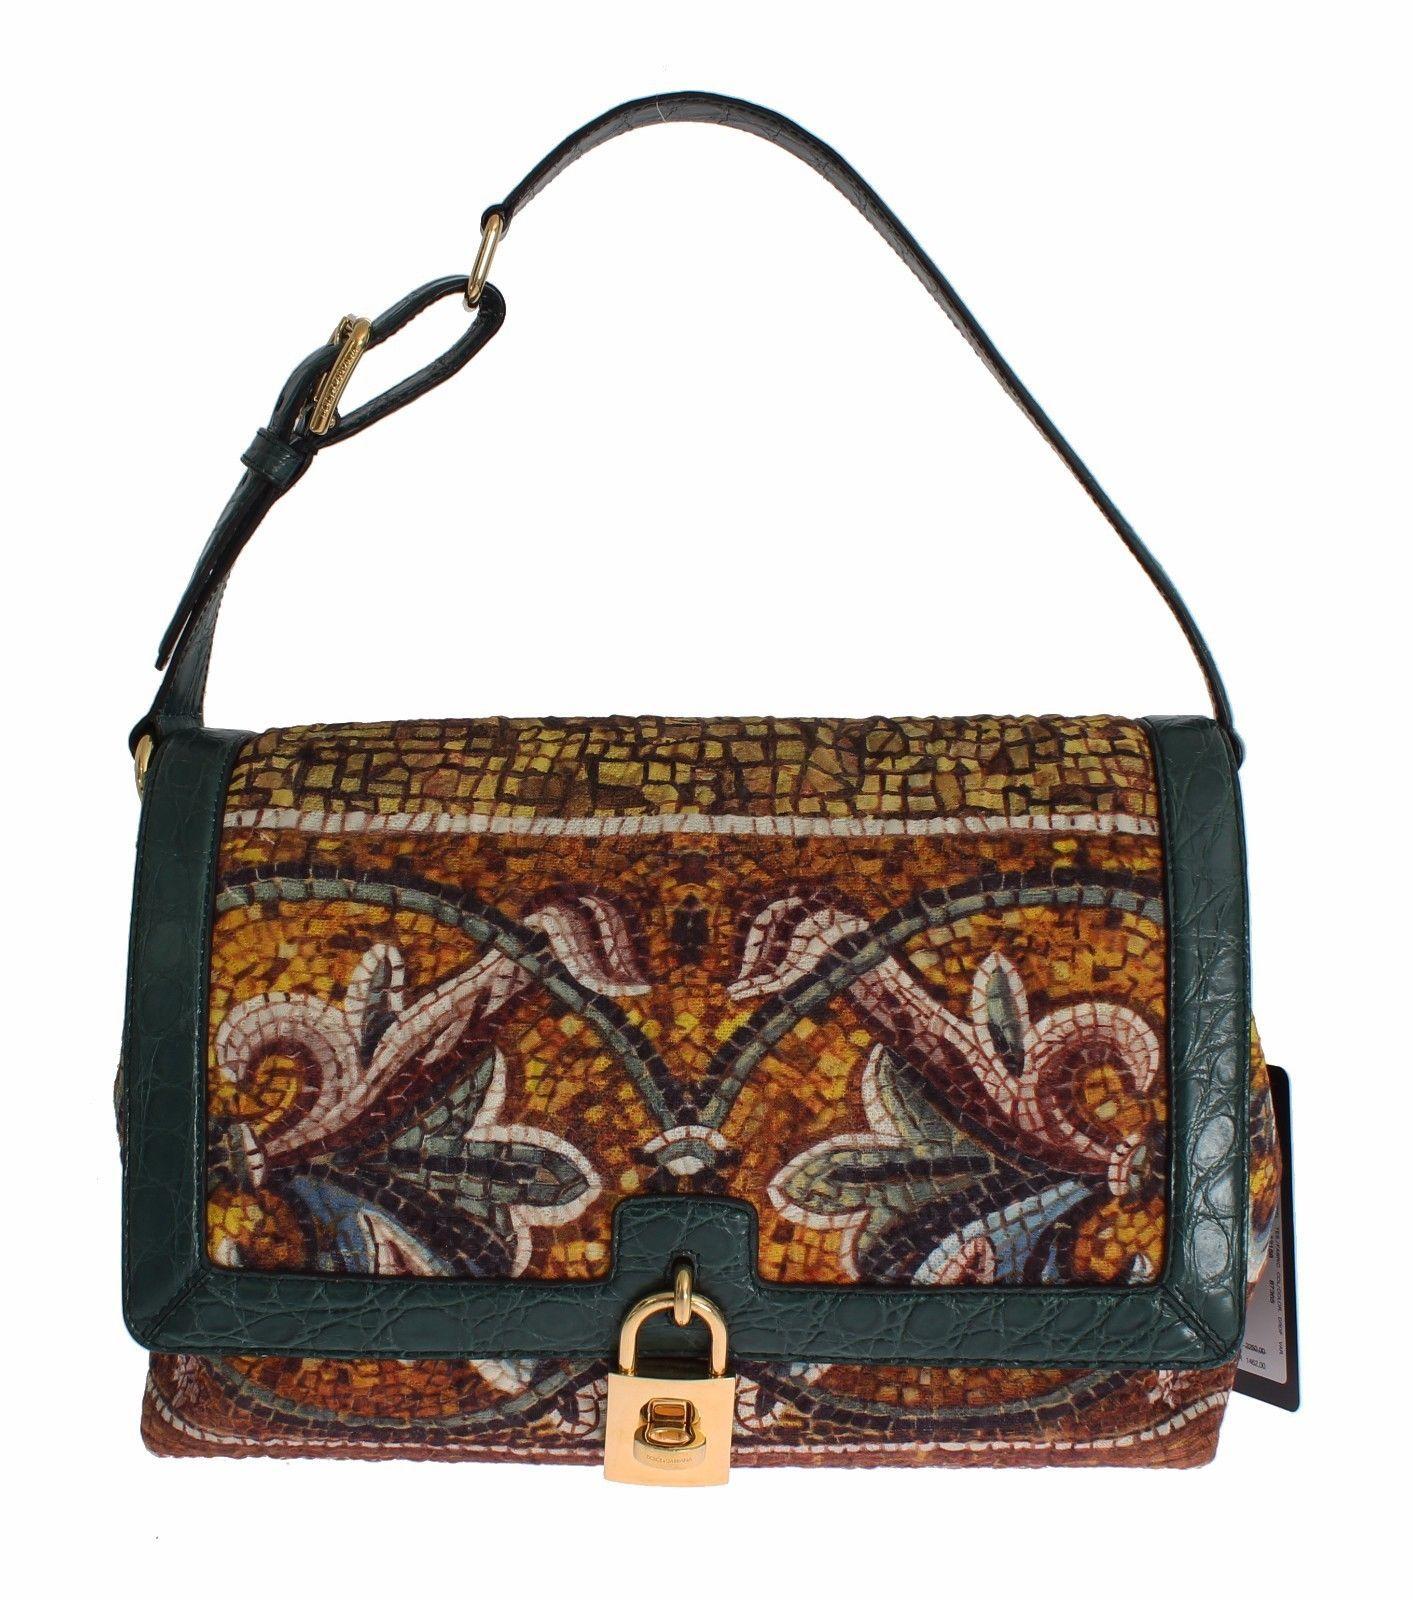 Dolce & Gabbana MISS BONITA Mosaic Brocade Crocodile Hand Shoulder Bag